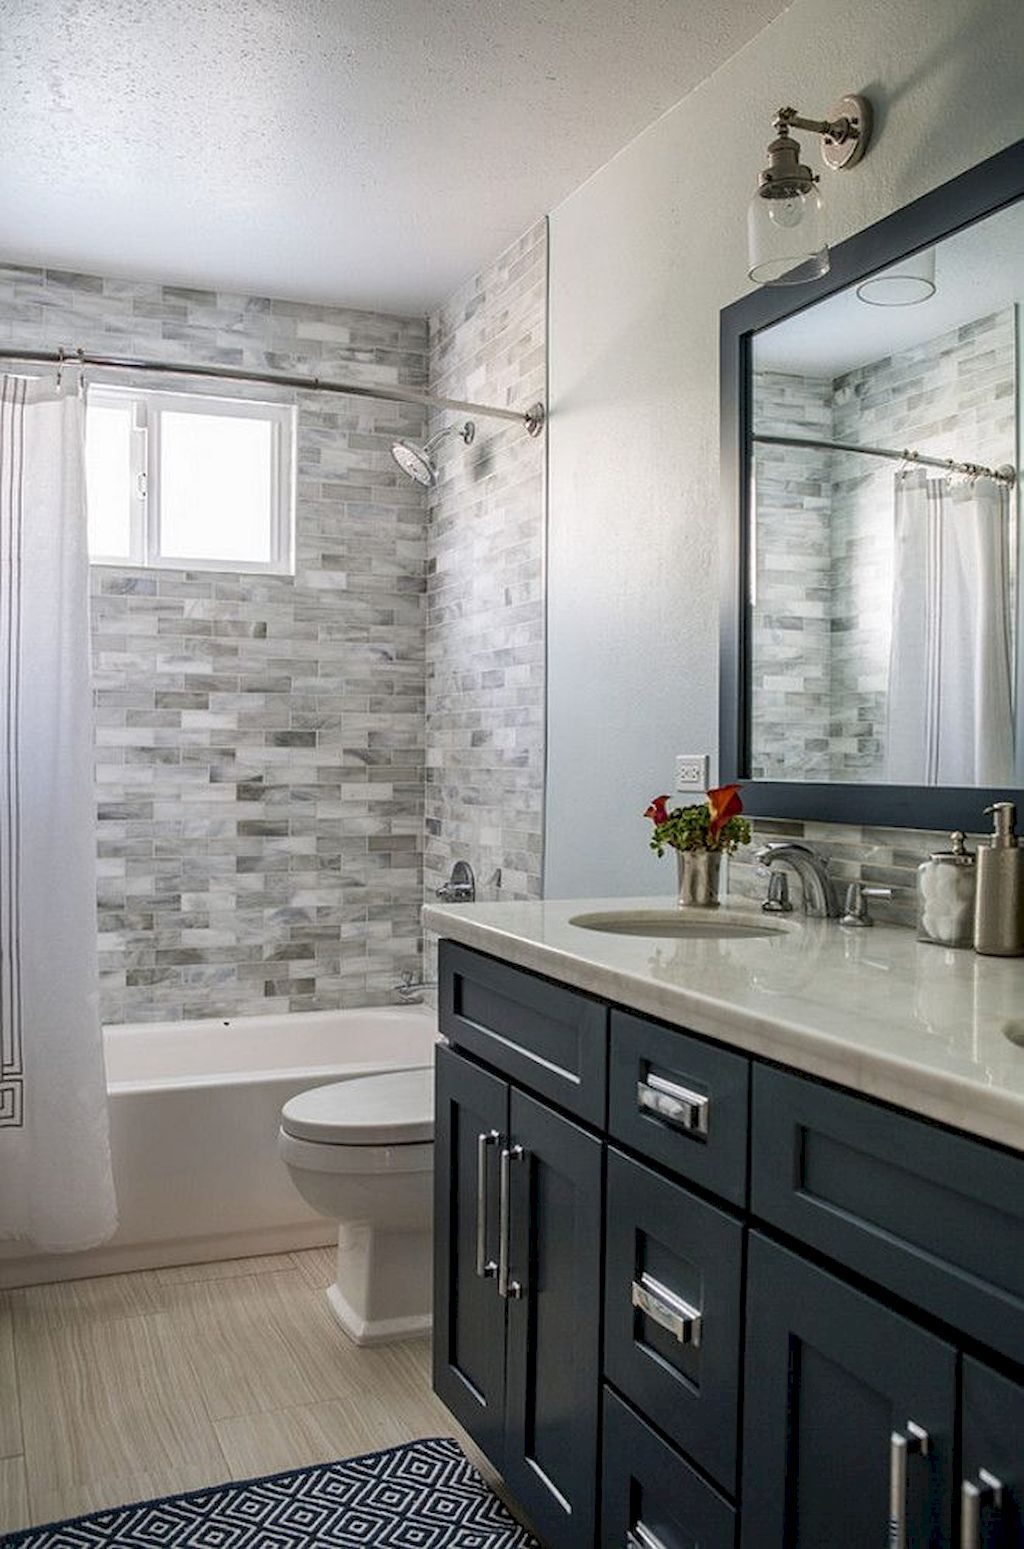 Stunning 85 Gorgeous Guest Bathroom Remodel Ideas Https Crowdecor